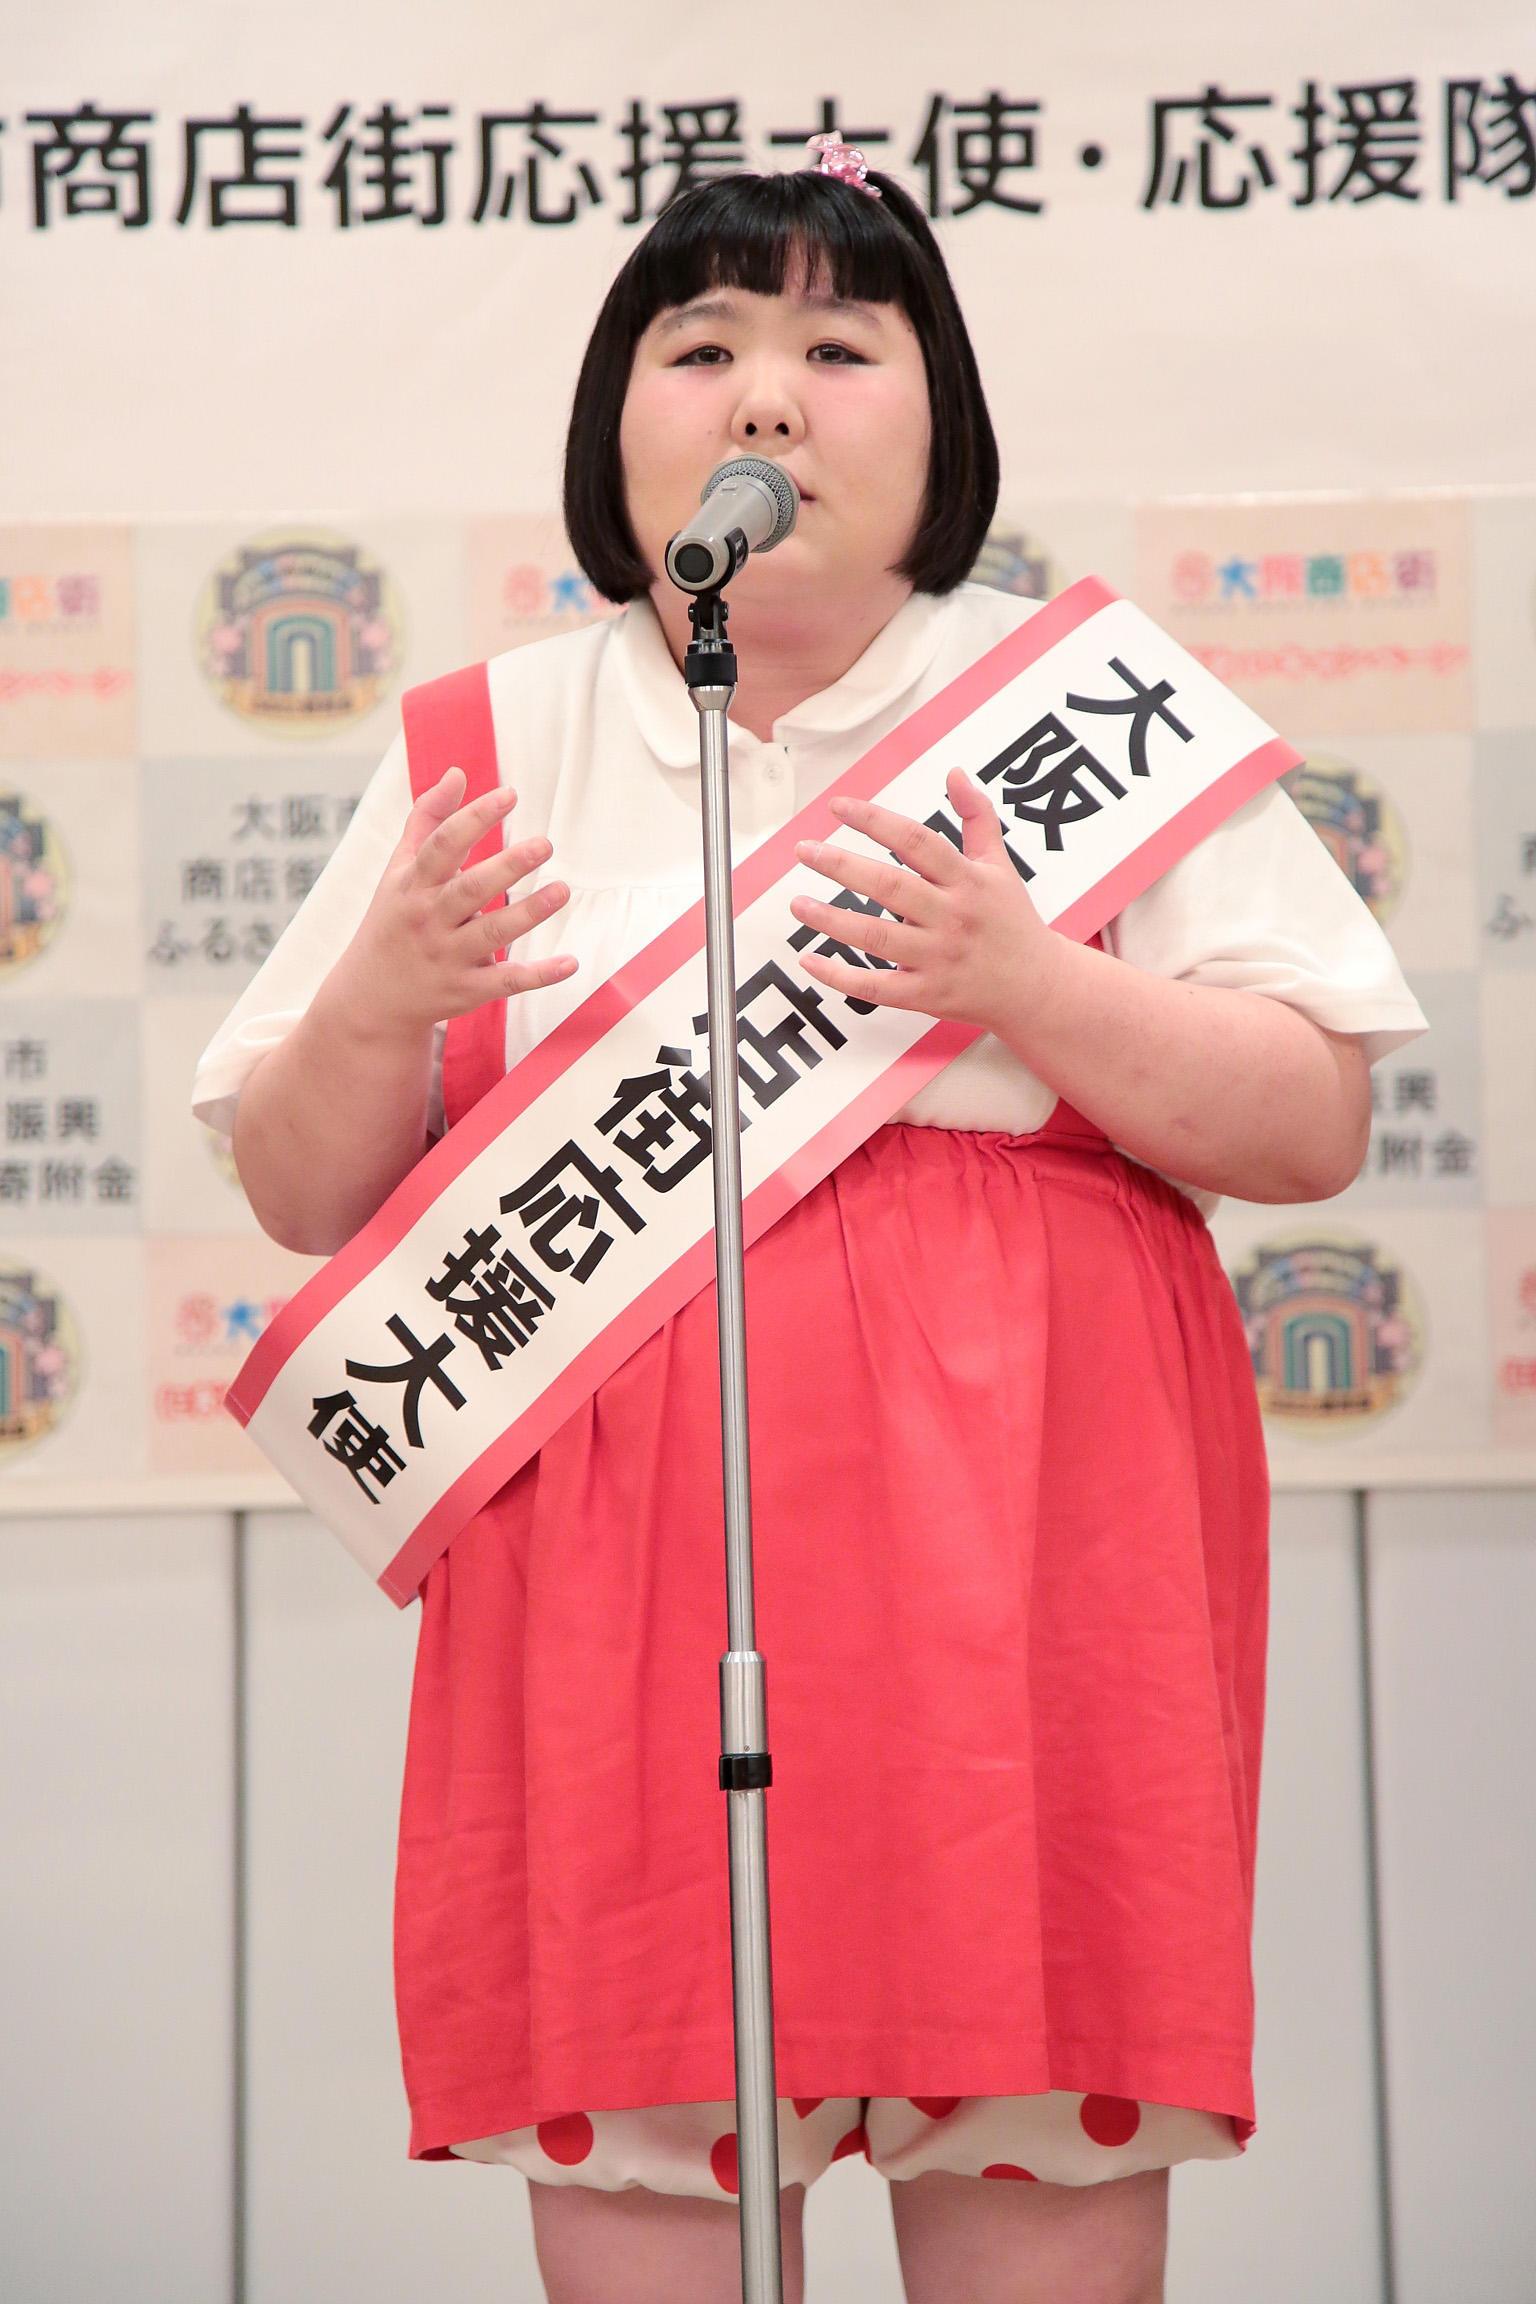 http://news.yoshimoto.co.jp/20180928232852-9f050fffbdca7d8a3a4ae734e64771bf2a3353d4.jpg